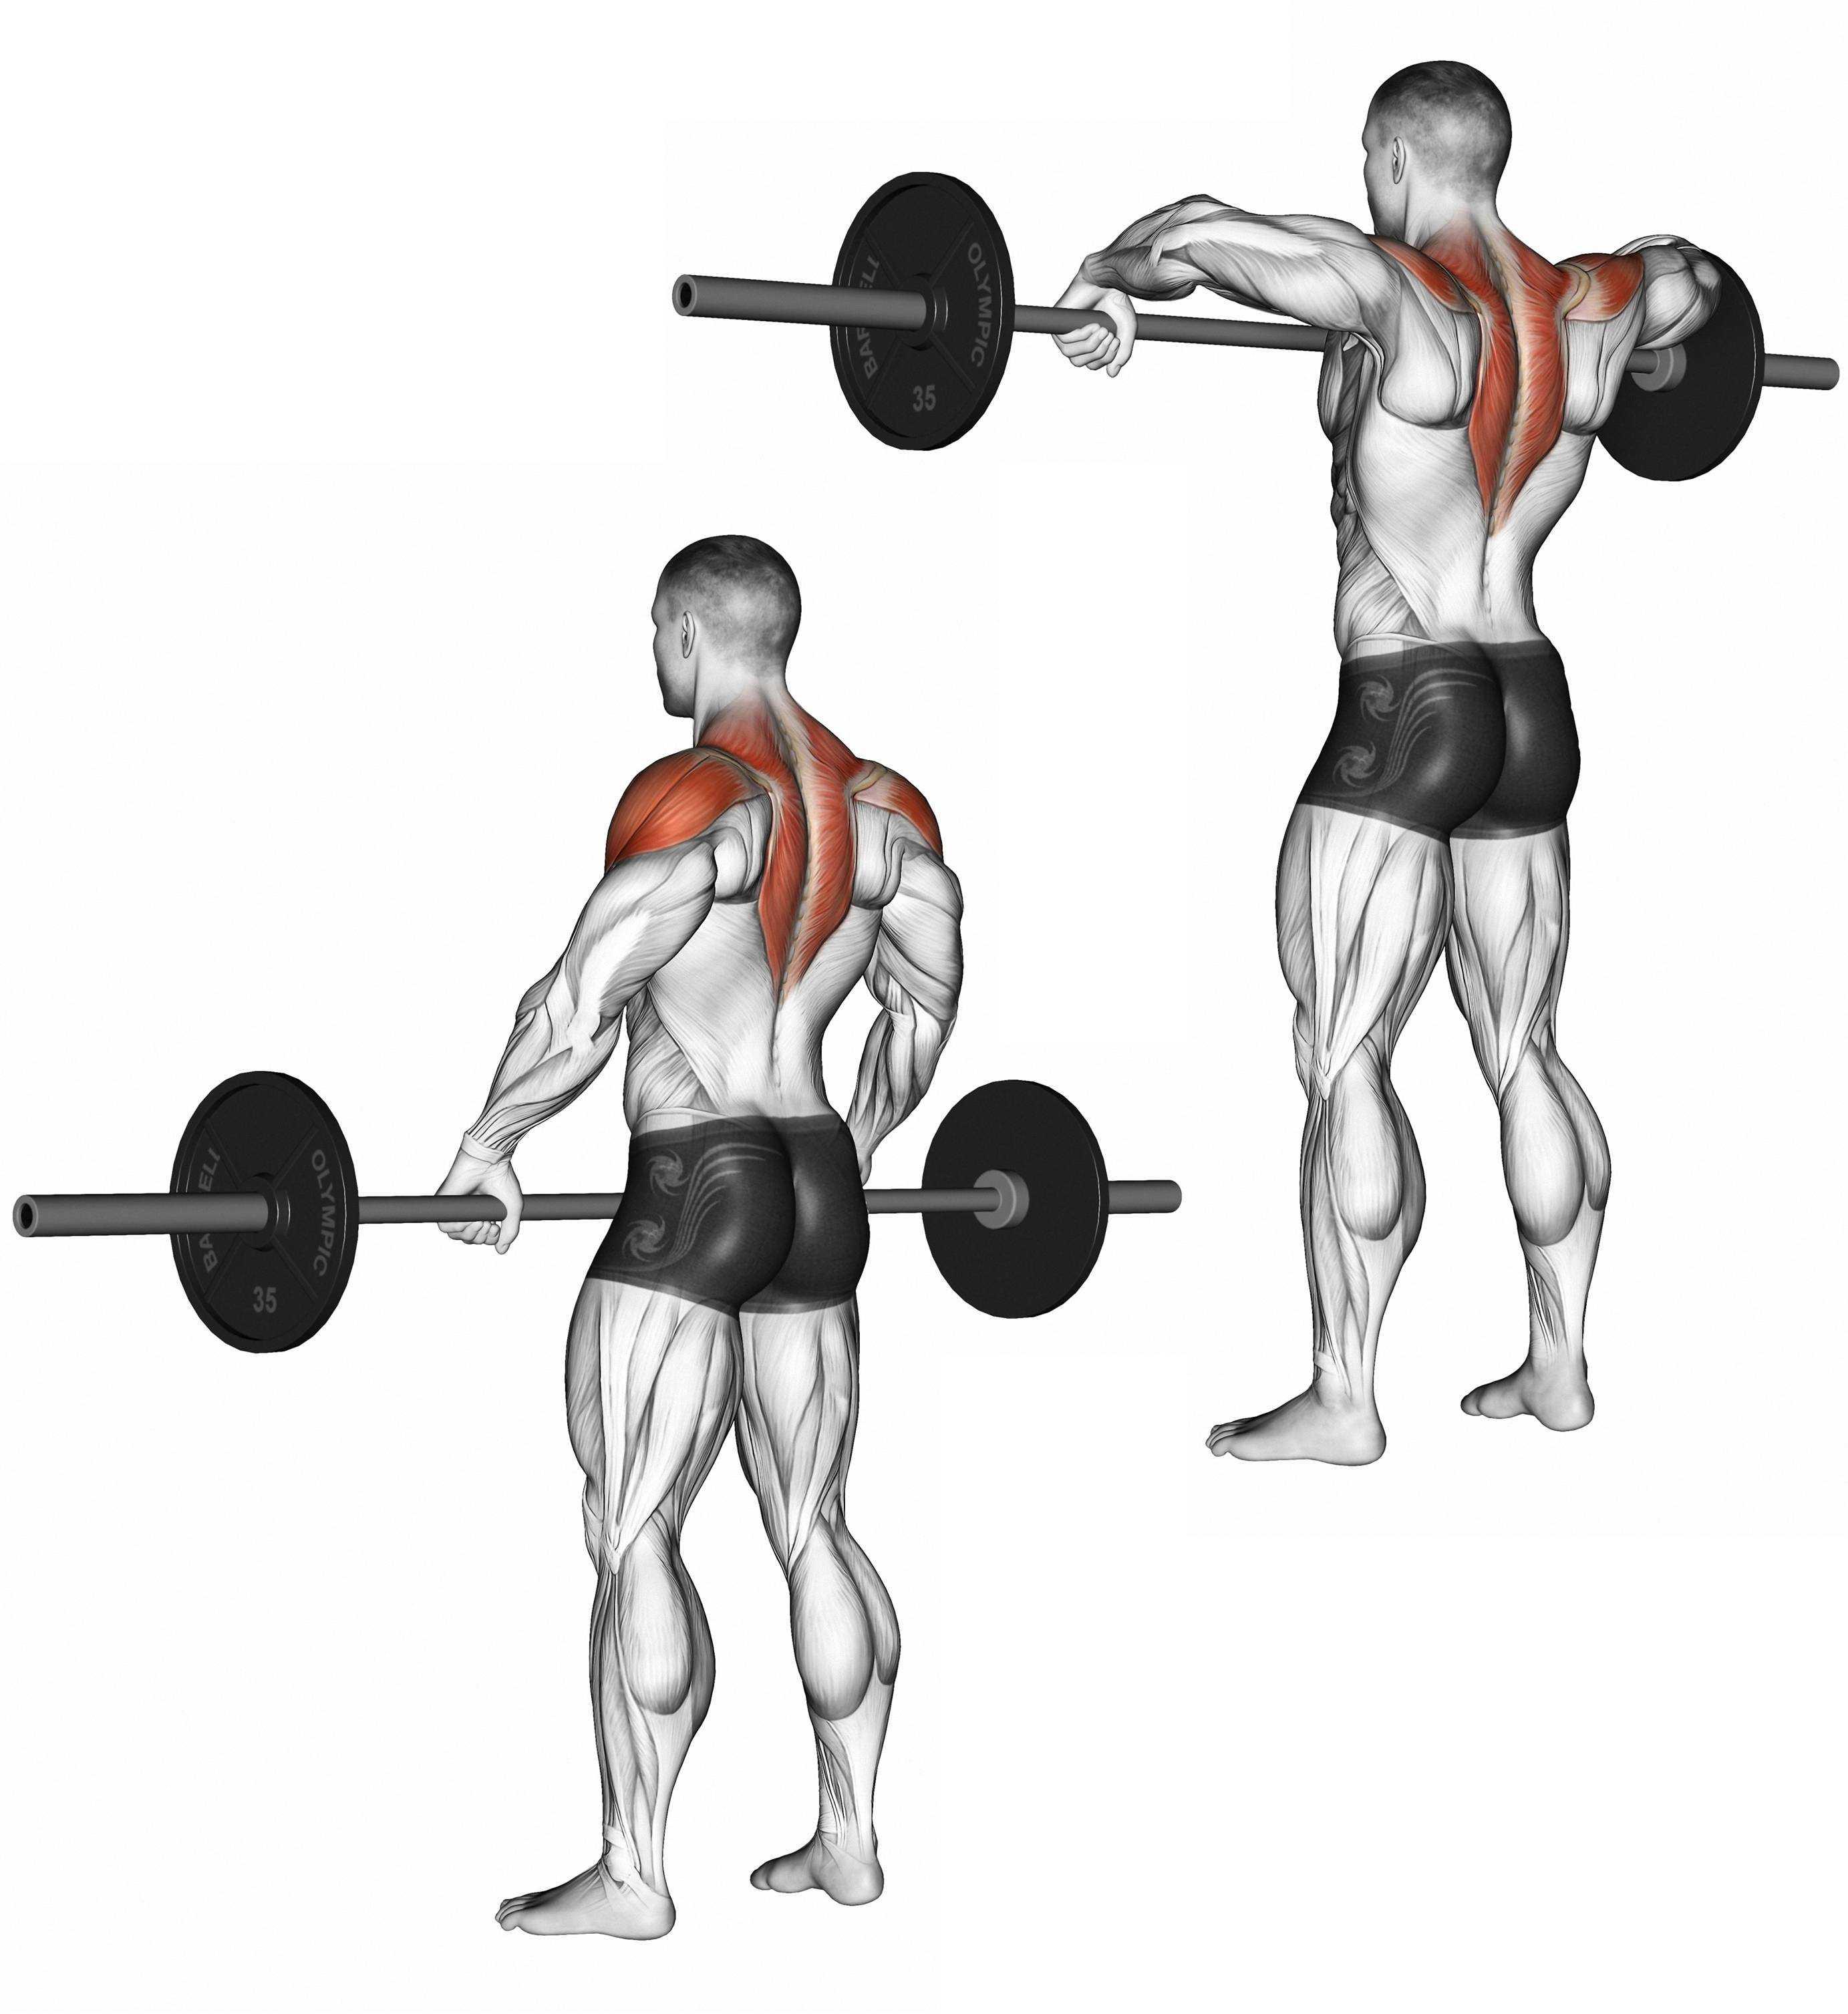 Тяга гантелей к подбородку – развиваем плечи